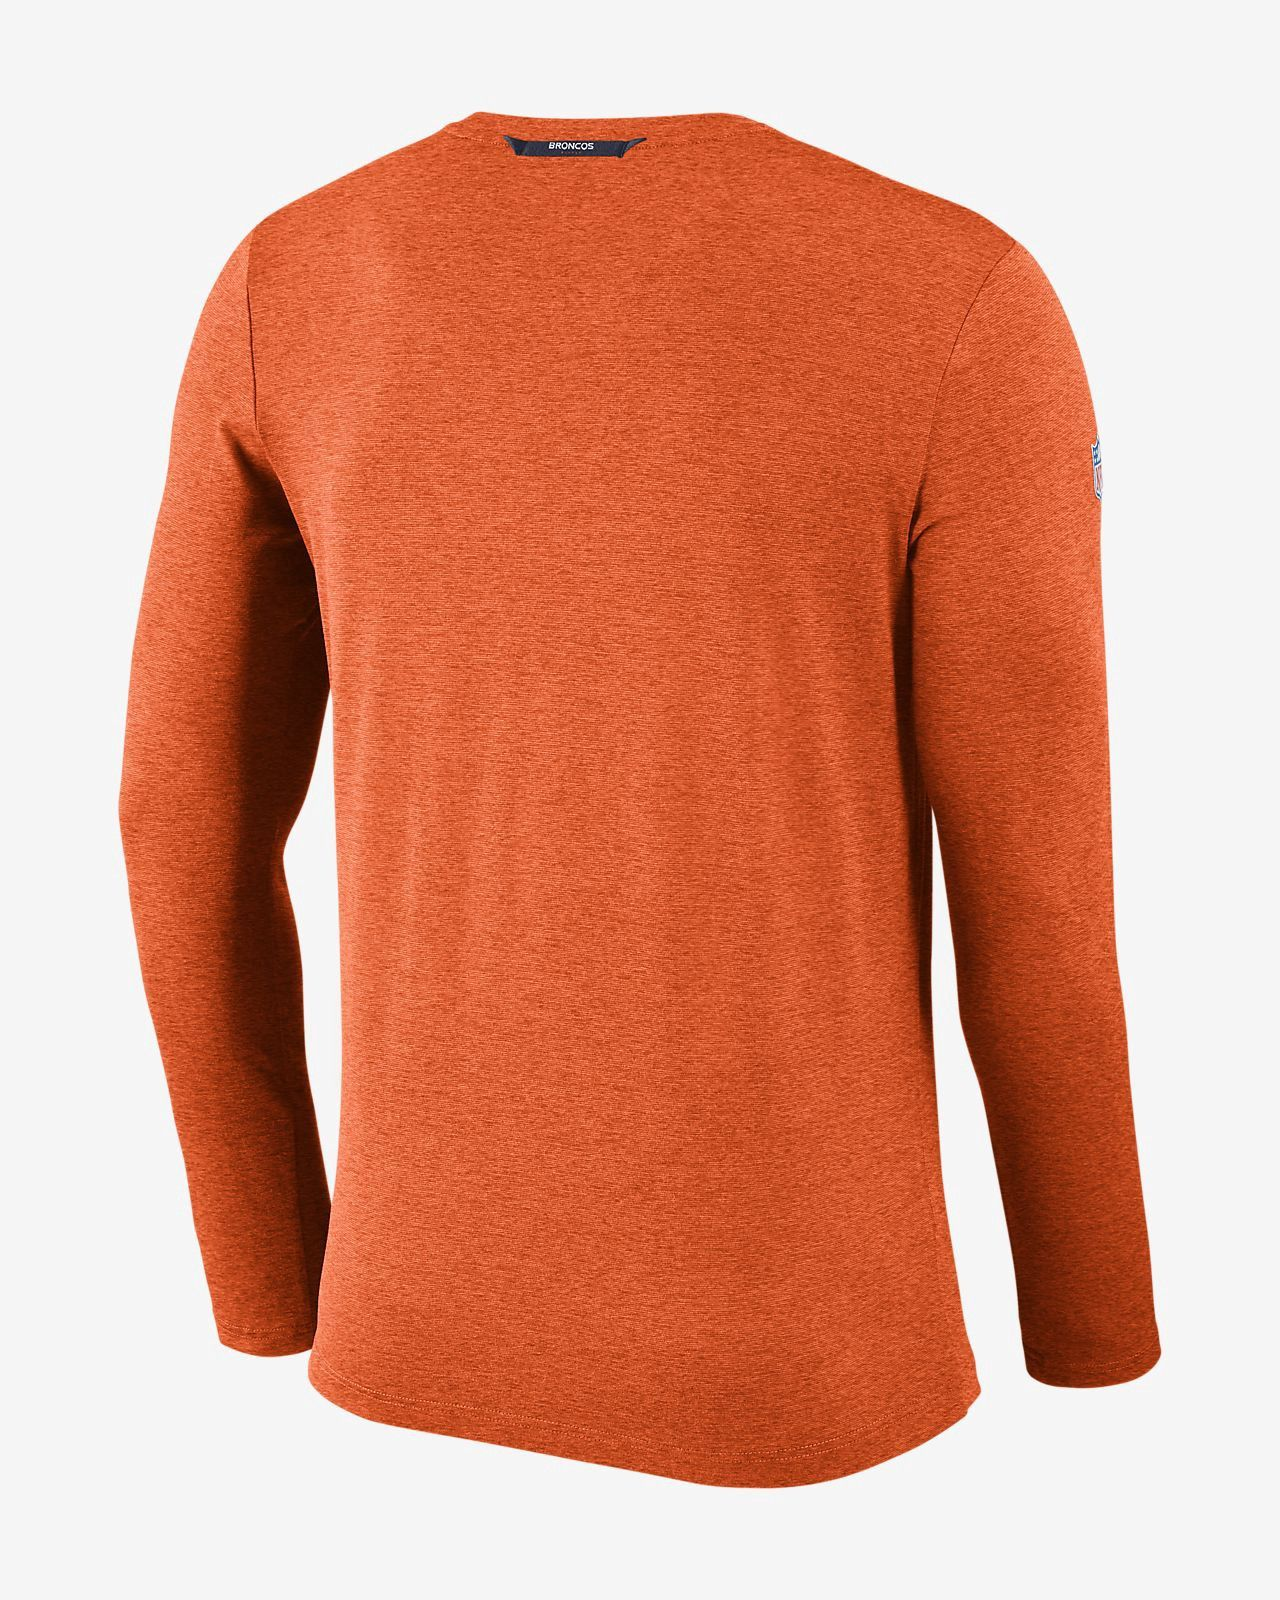 3871aab3aace2a Nike Dri-Fit Coach (Nfl Broncos) Men s Long Sleeve Football Top - 3XL Navy